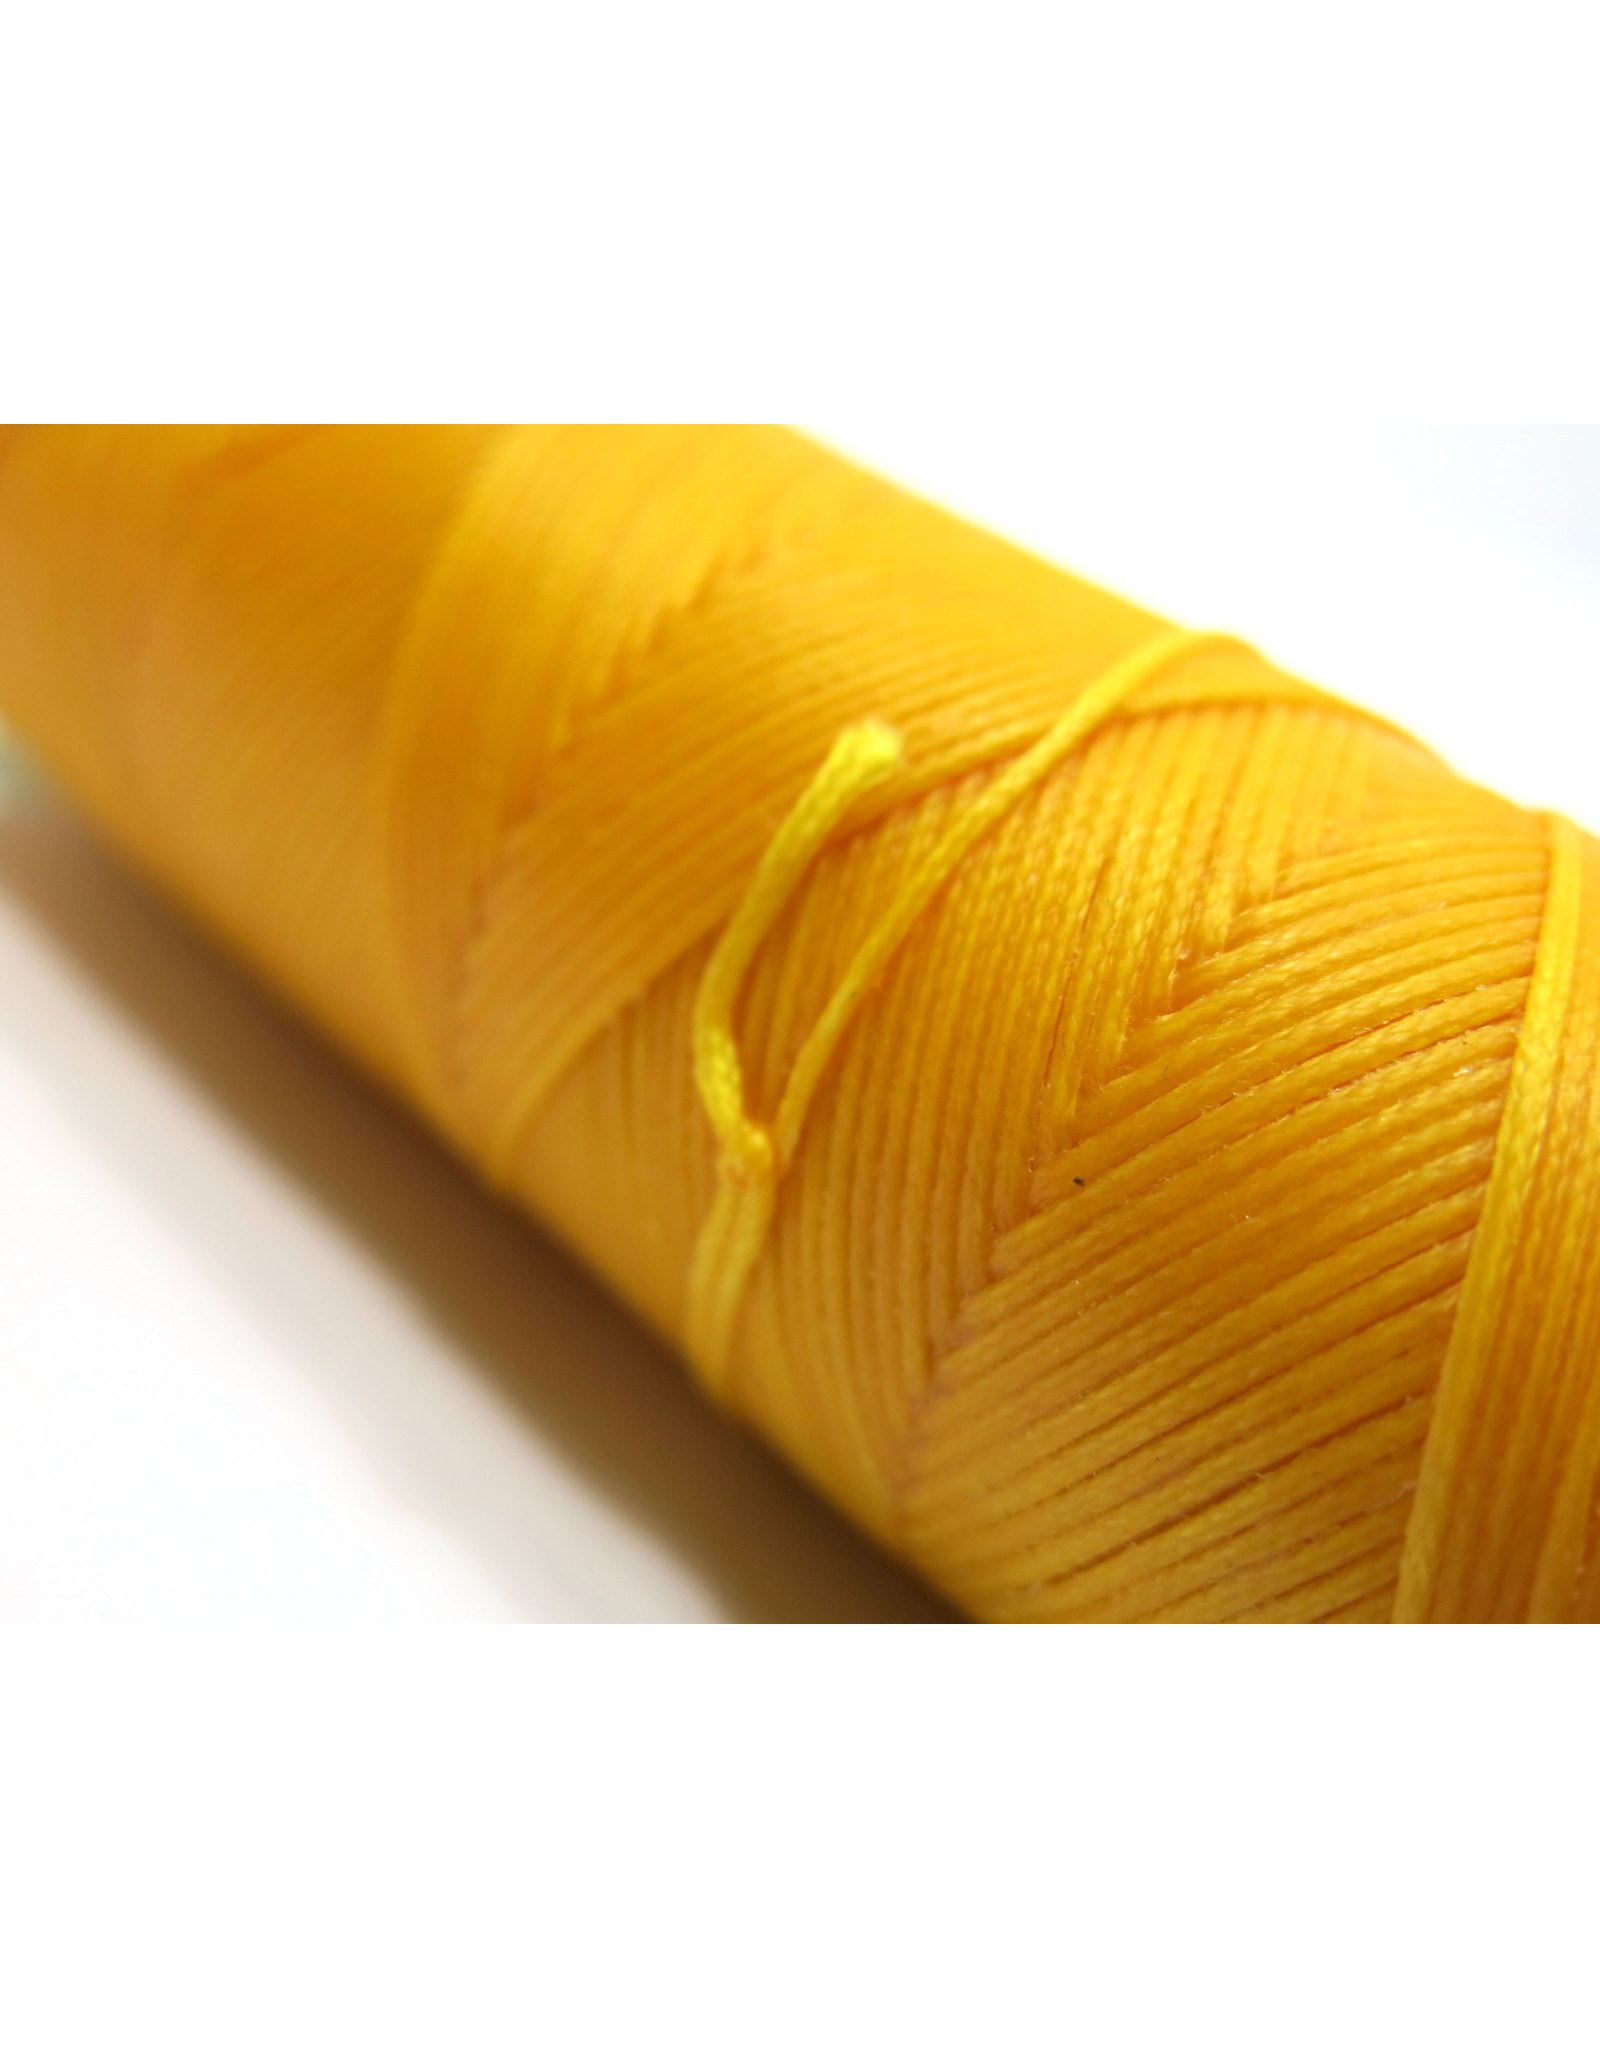 Waxed hand sewing thread yellow